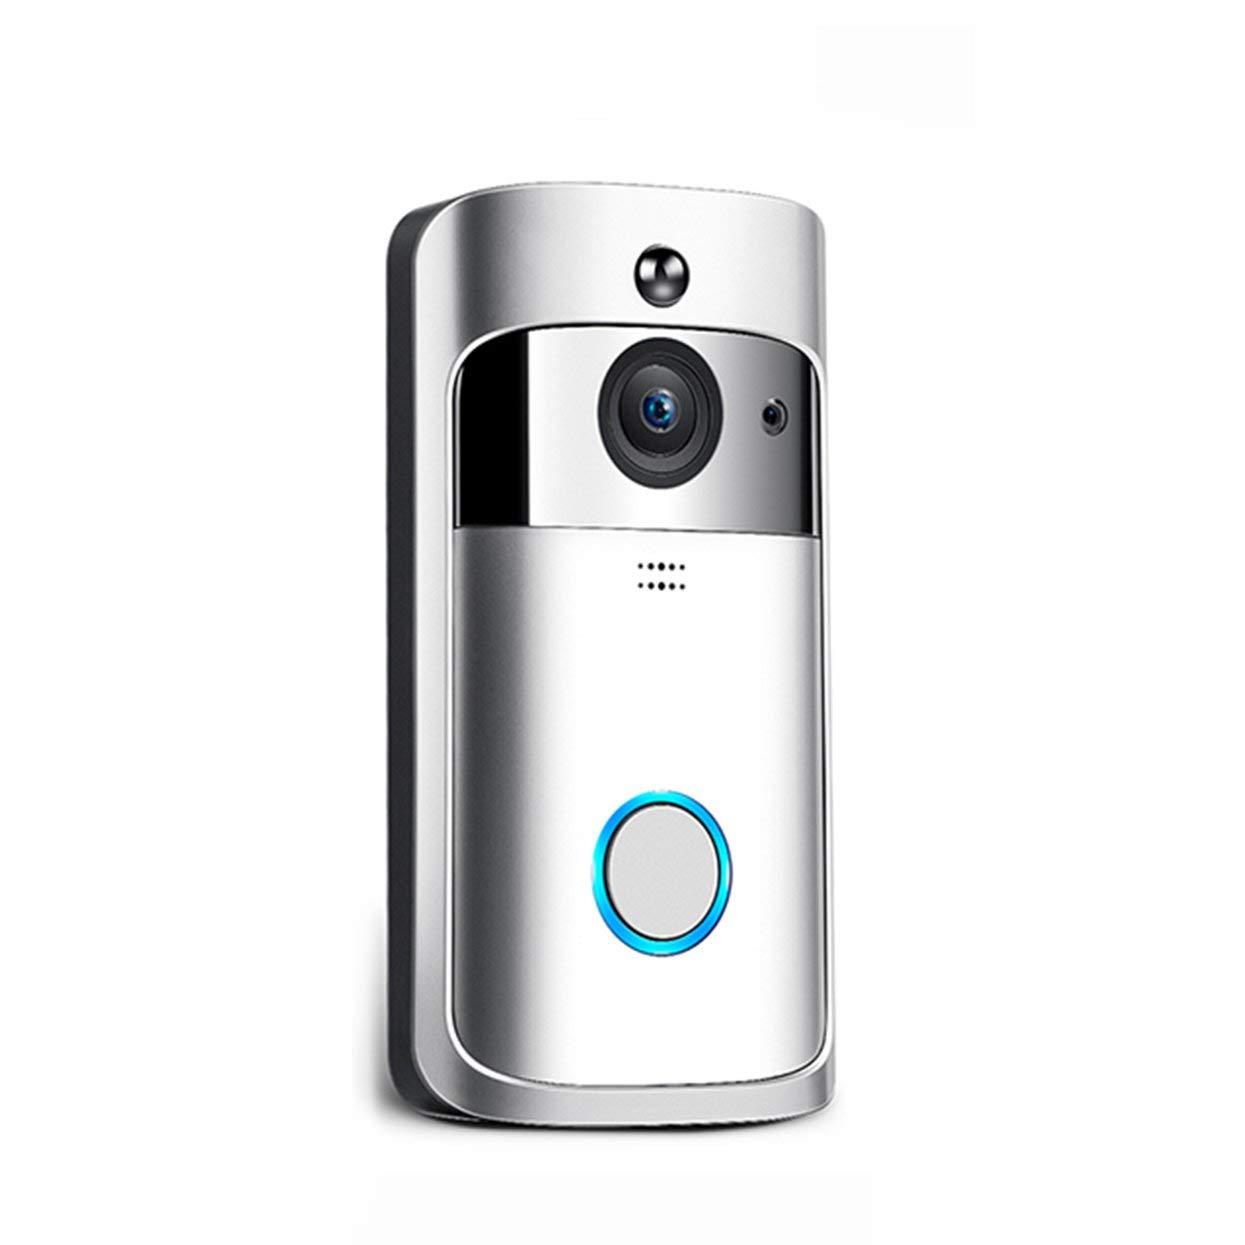 M3 Nachtsicht WIFI Smart Video Türklingel Wireless Portable Home Türklingel Schnurloses Telefon Intercom Smart Home Teile